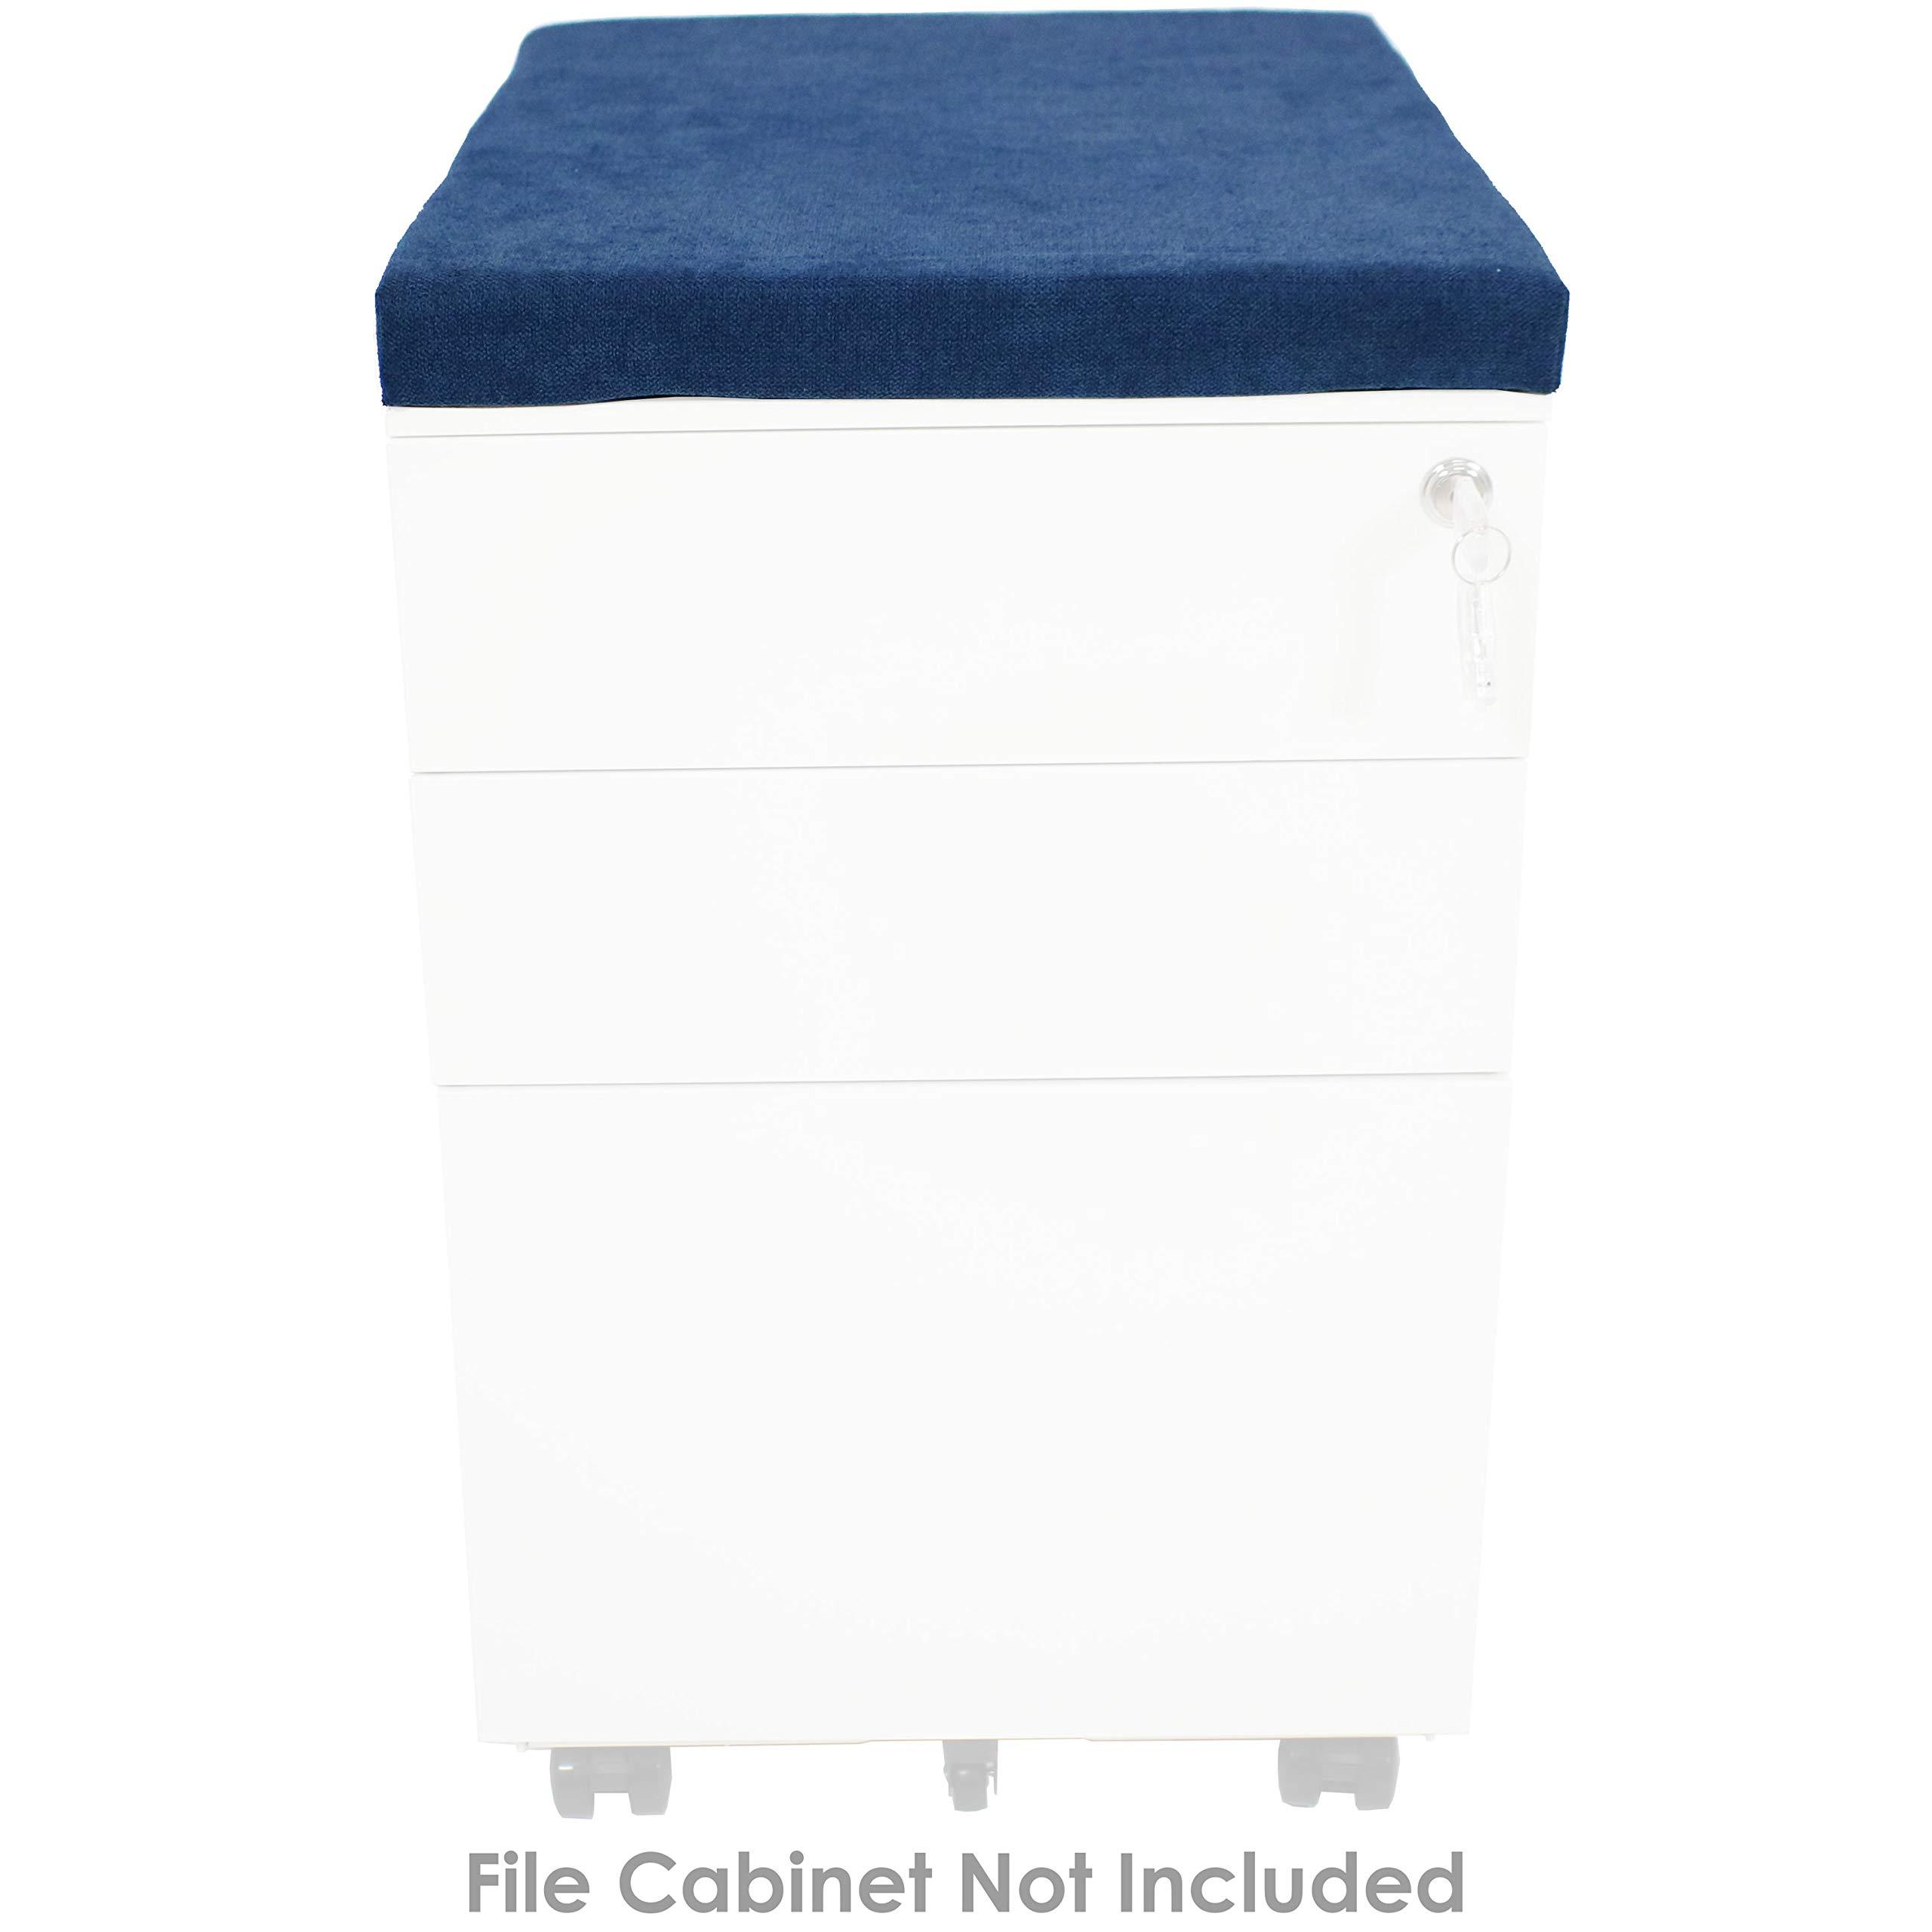 CASL Brands File Cabinet Cushion Seat Top for Mobile Pedestals, Magnetic Back, Blue by CASL Brands (Image #5)